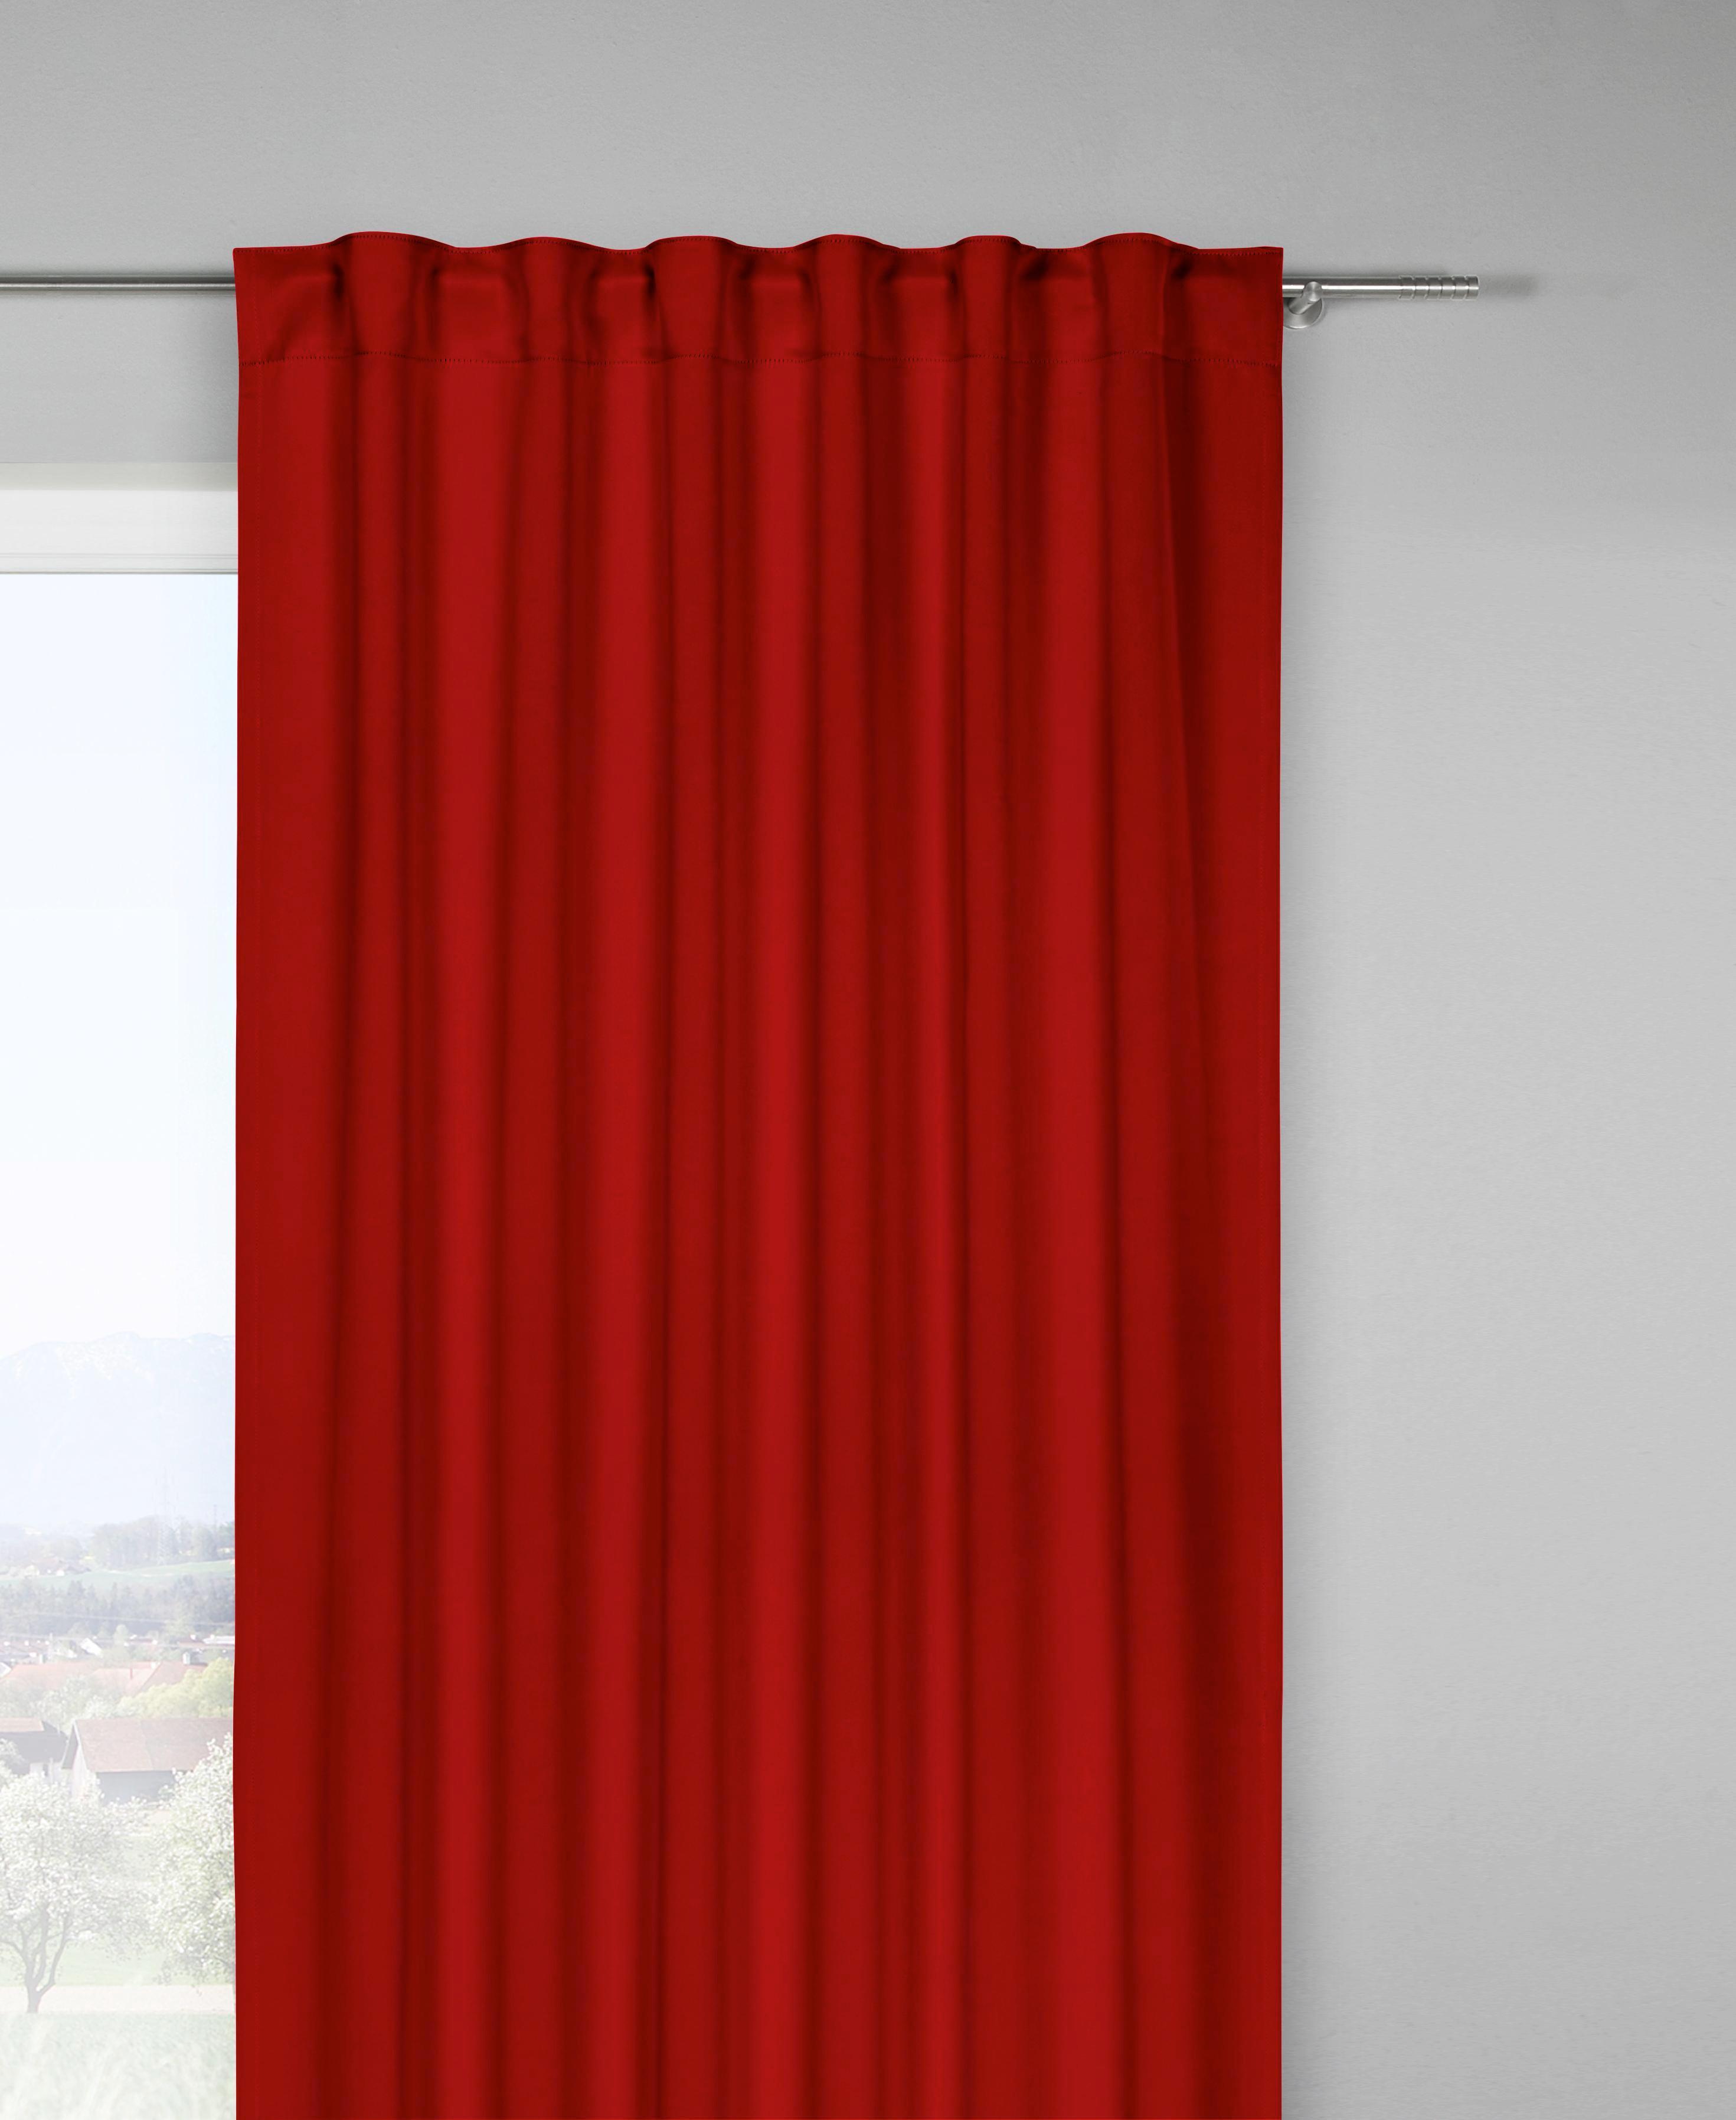 Verdunkelungsvorhang Riccardo in Rot, ca. 140/245cm - Rot, MODERN, Textil (140/245cm) - MÖMAX modern living